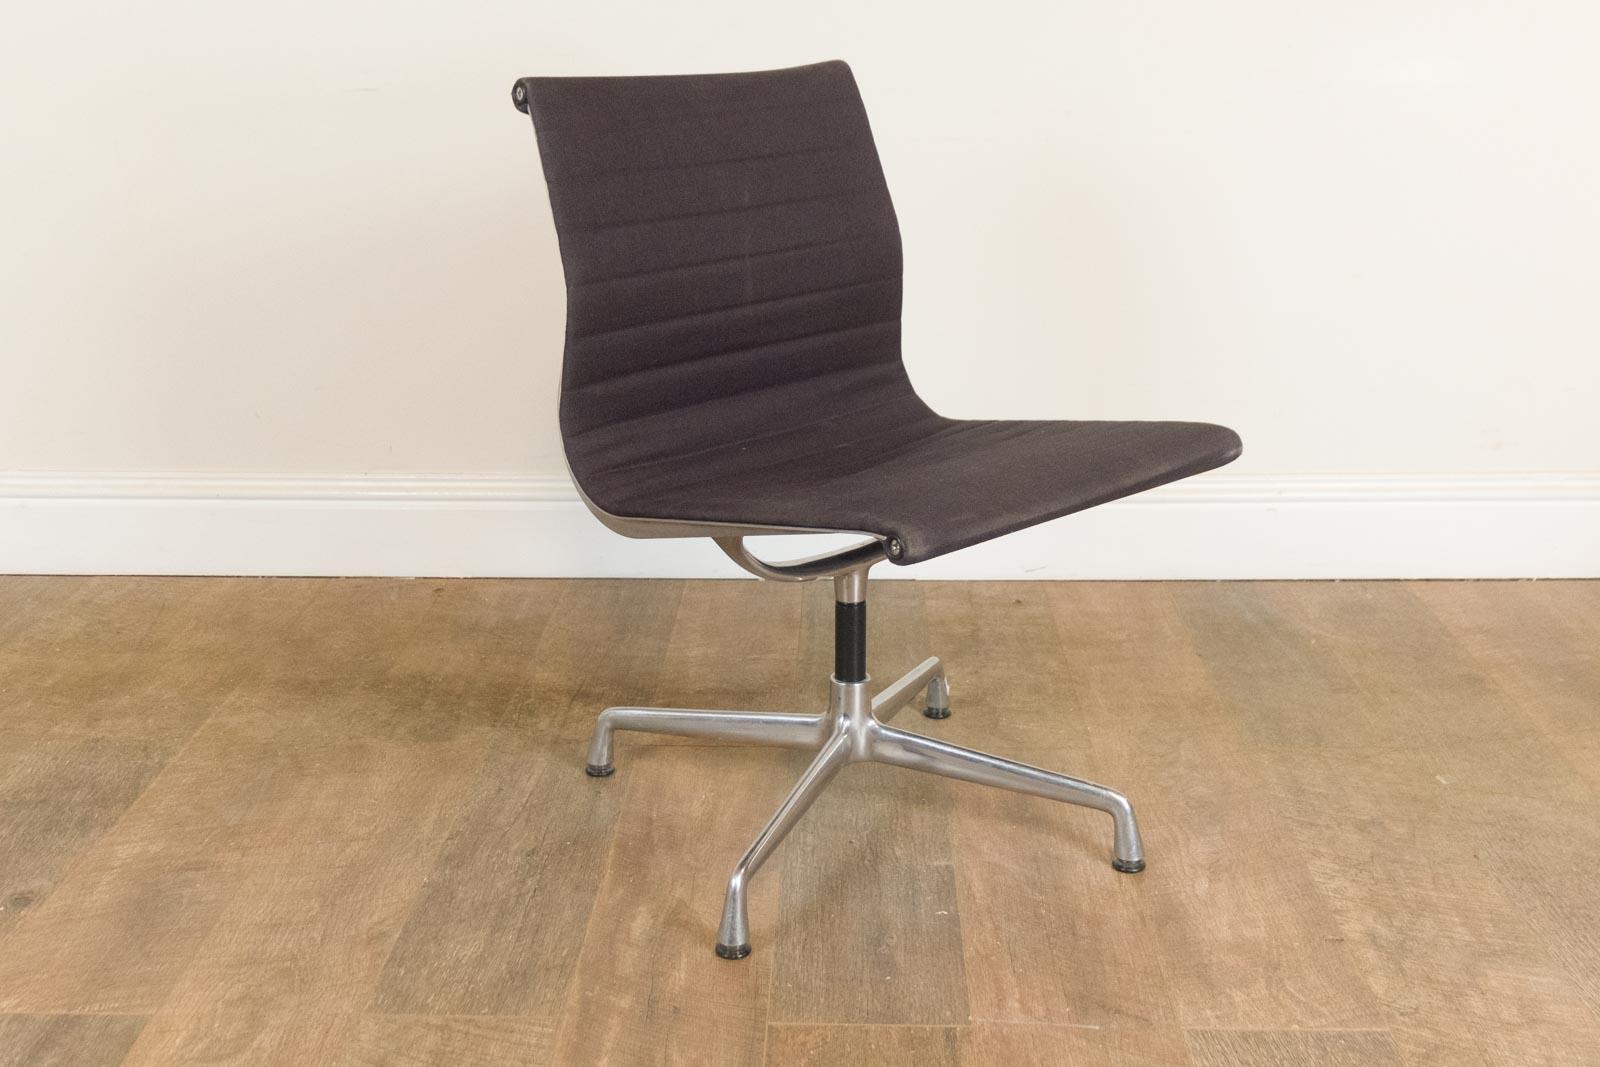 Vitra Chalres Eames : Vintage retro vitra eames ea105 black fabric swivel chair ebay